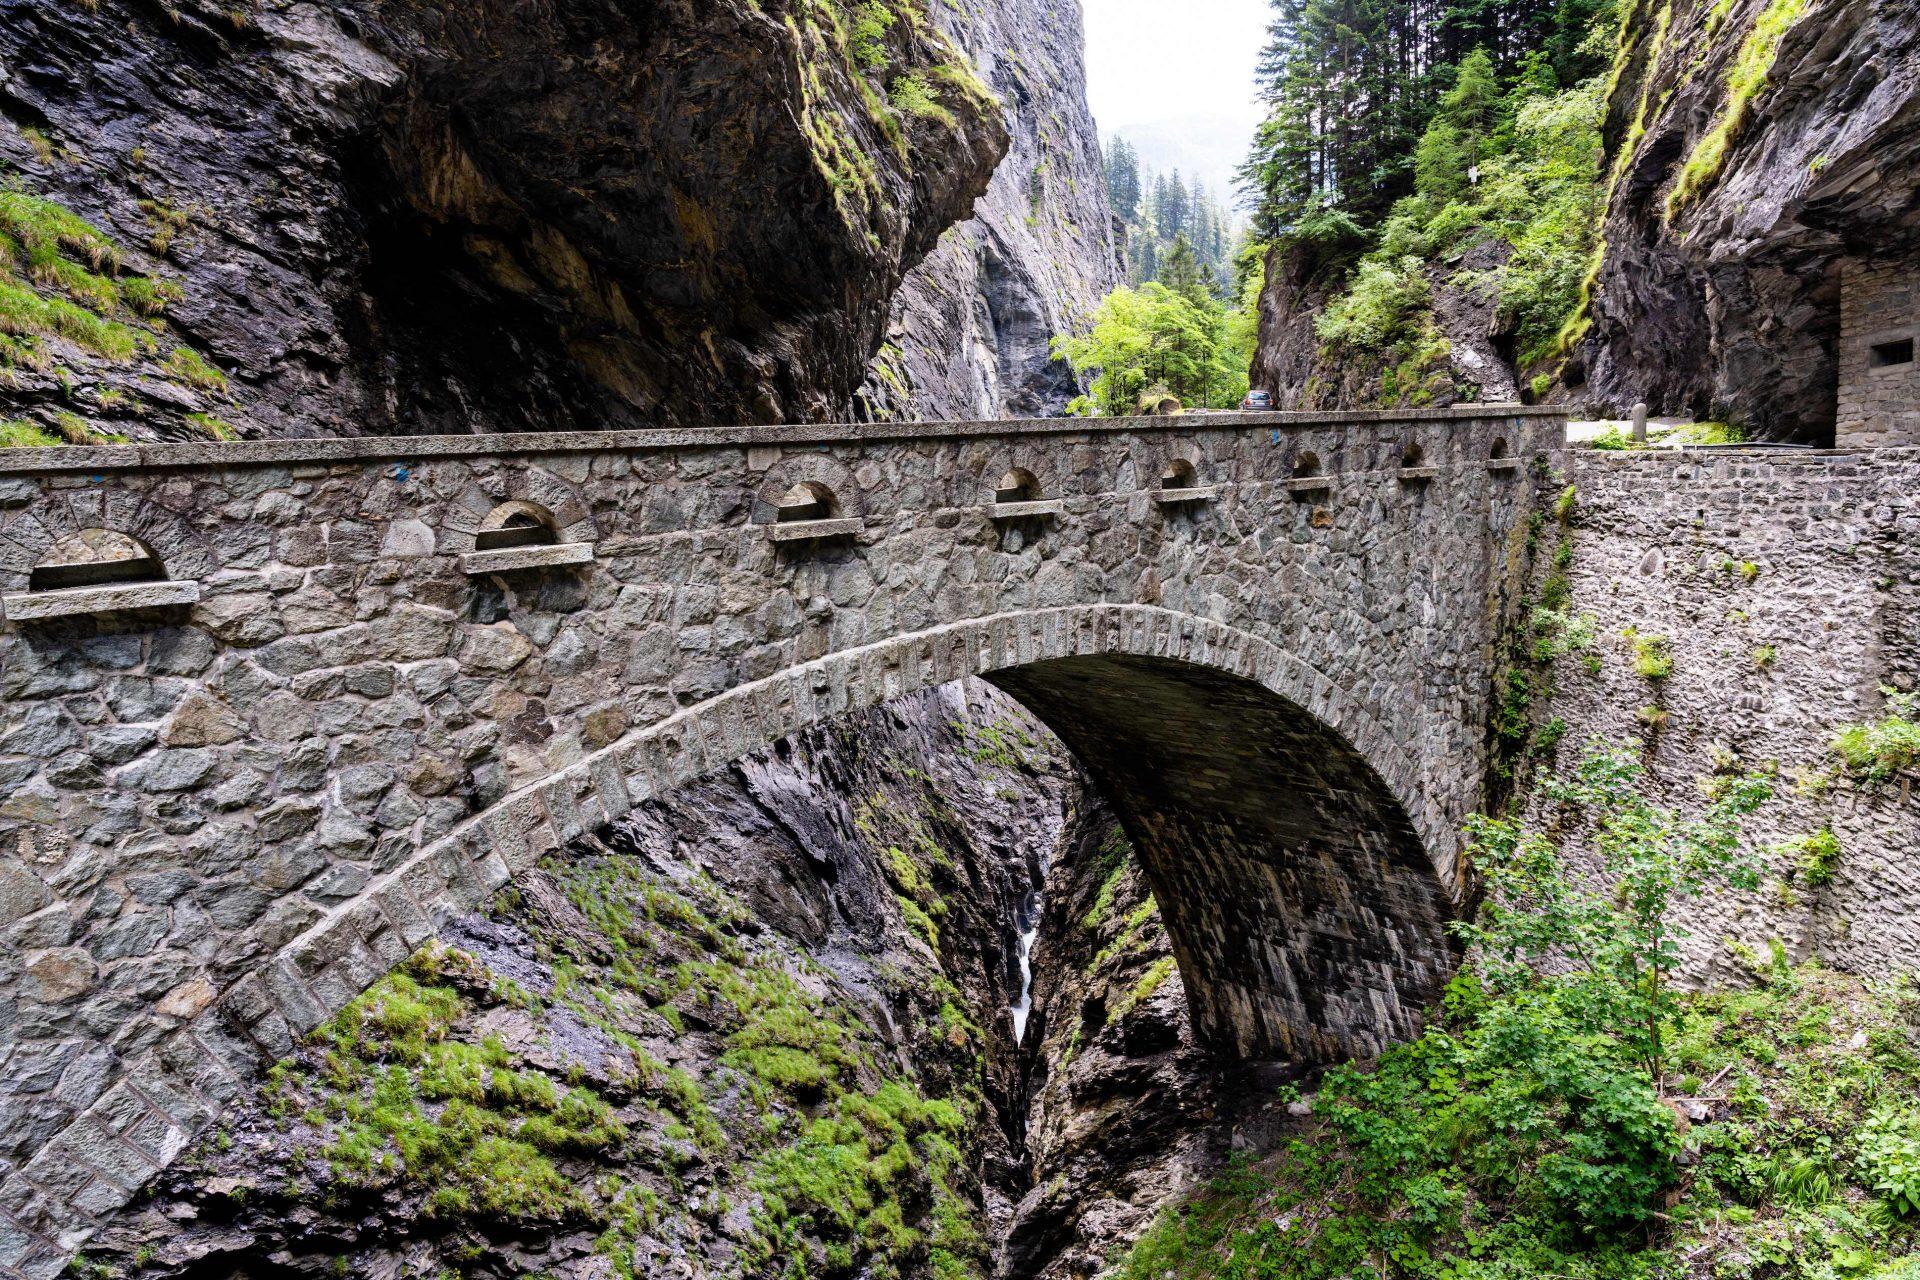 historic stone bridge crossing the deep Viamala Gorge in the Swiss Alps near Thusis